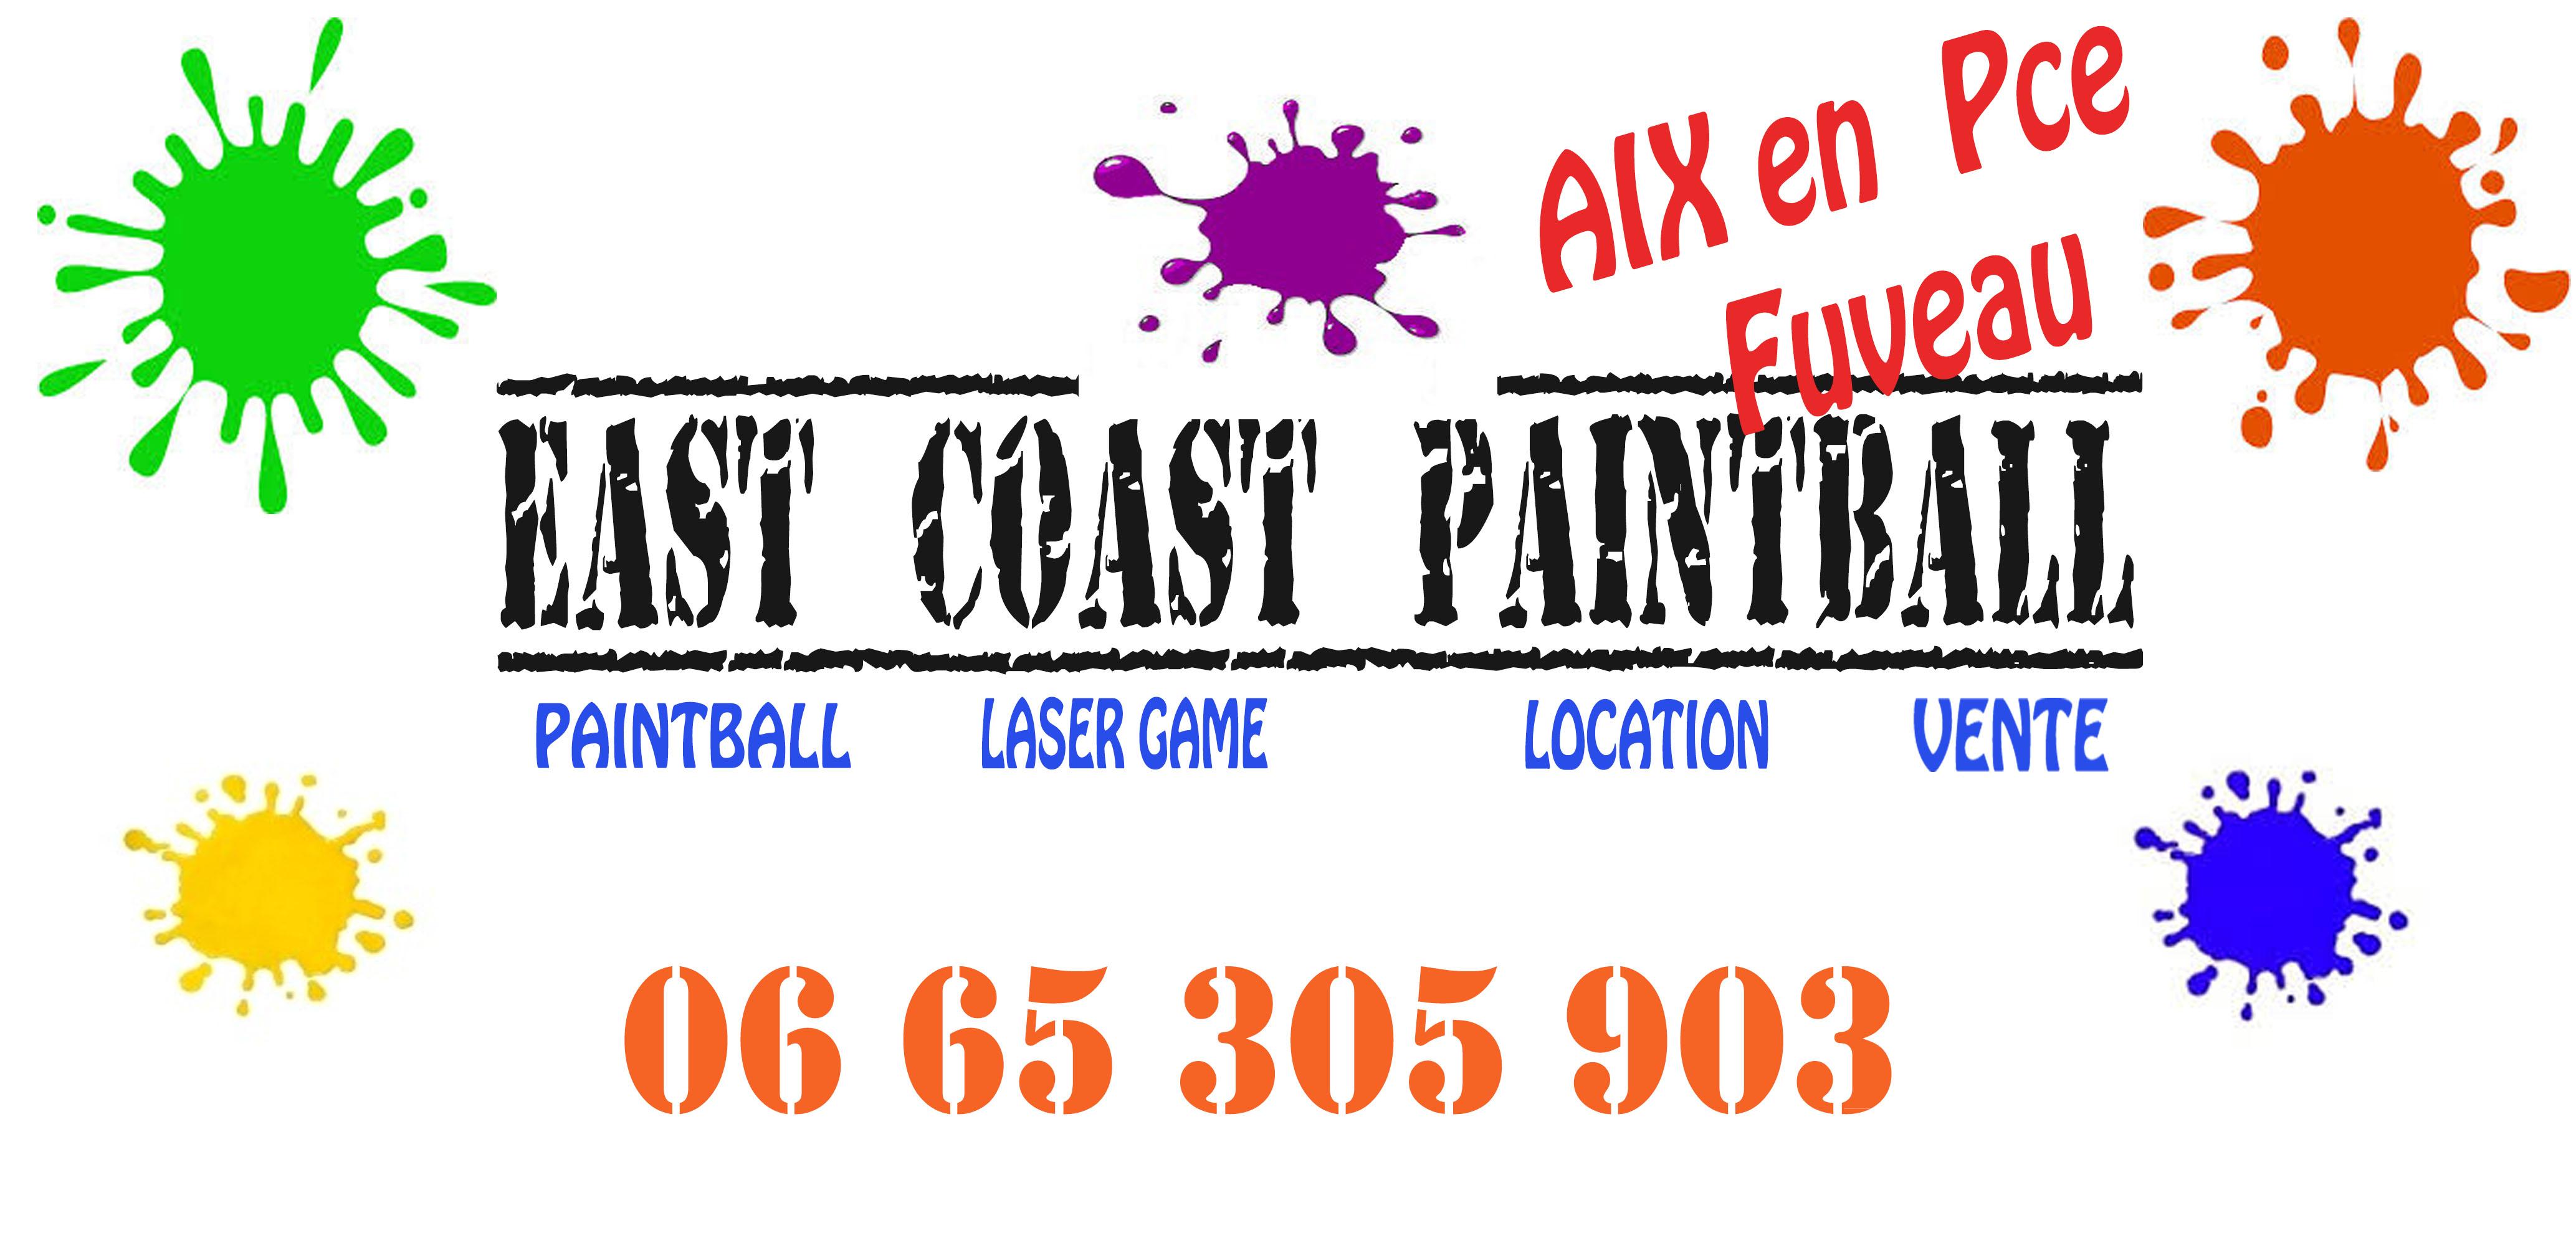 east coast paintball